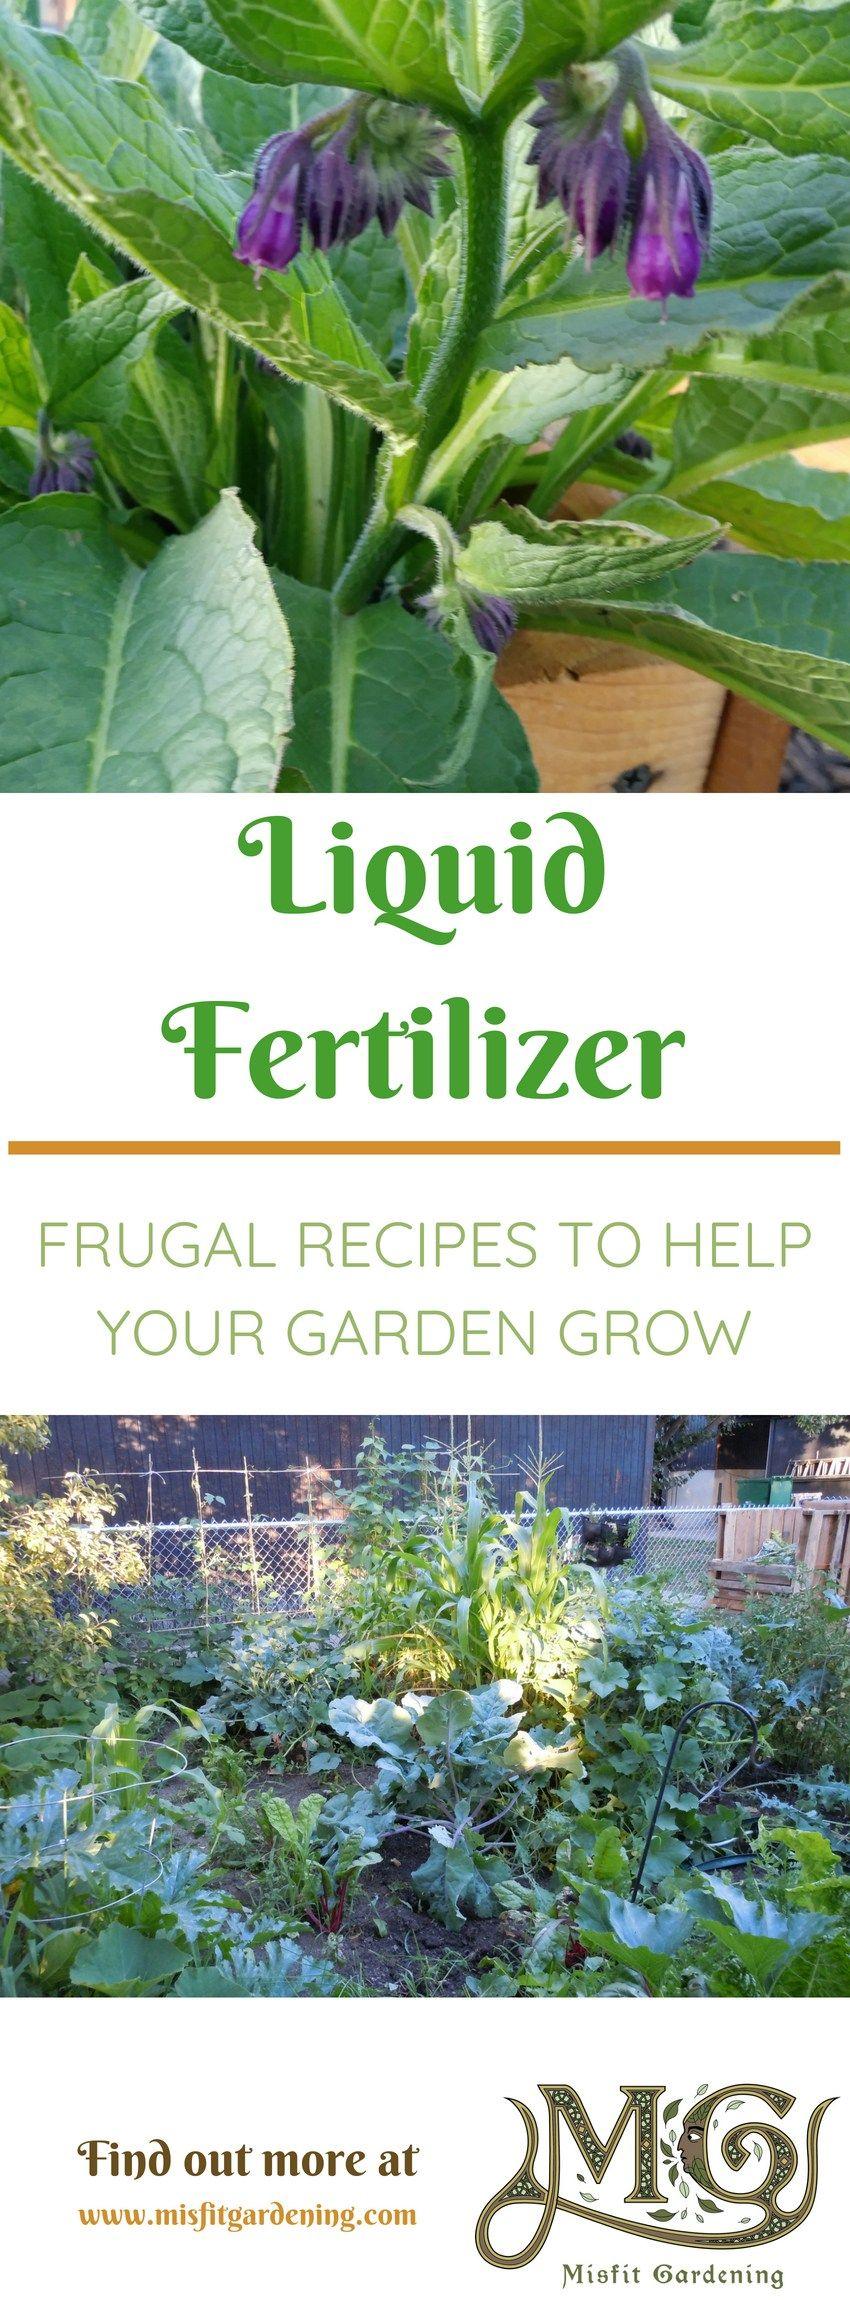 Diy grass clipping liquid fertilizer recipe liquid